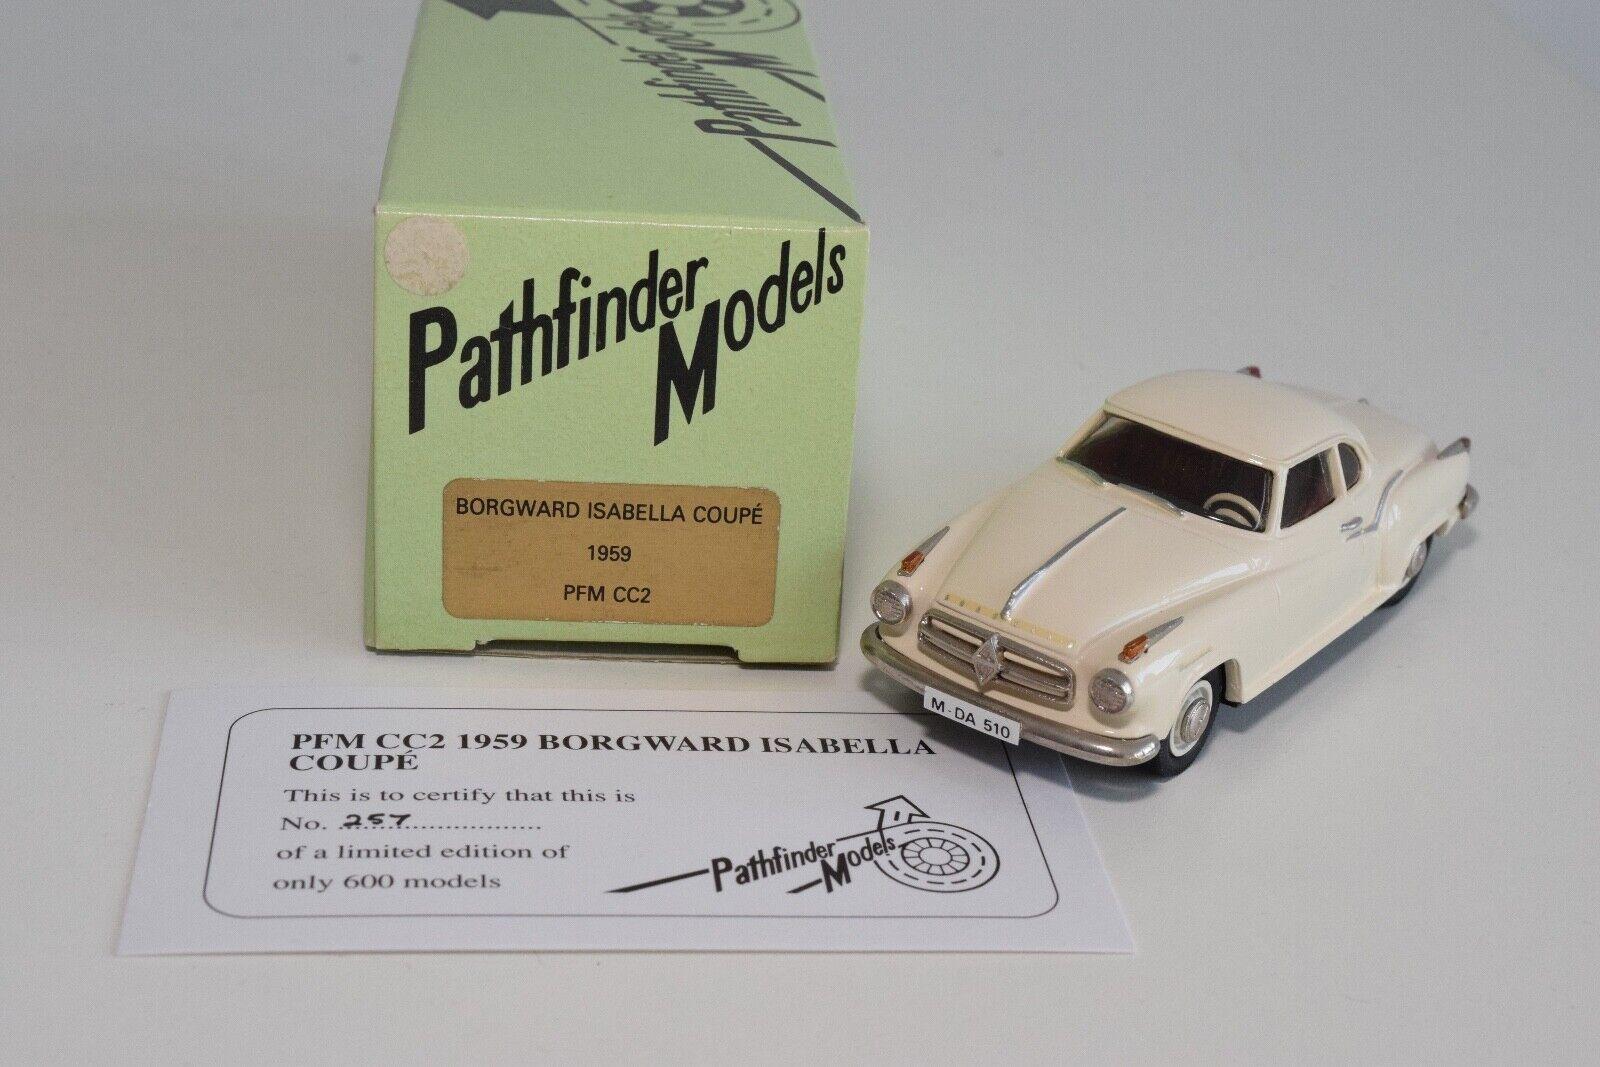 FF 1 43 PATHFINDER PFM CC2 PFMCC2 BORGWARD ISABELLA COUPE 1959 MIB RARE 257 600